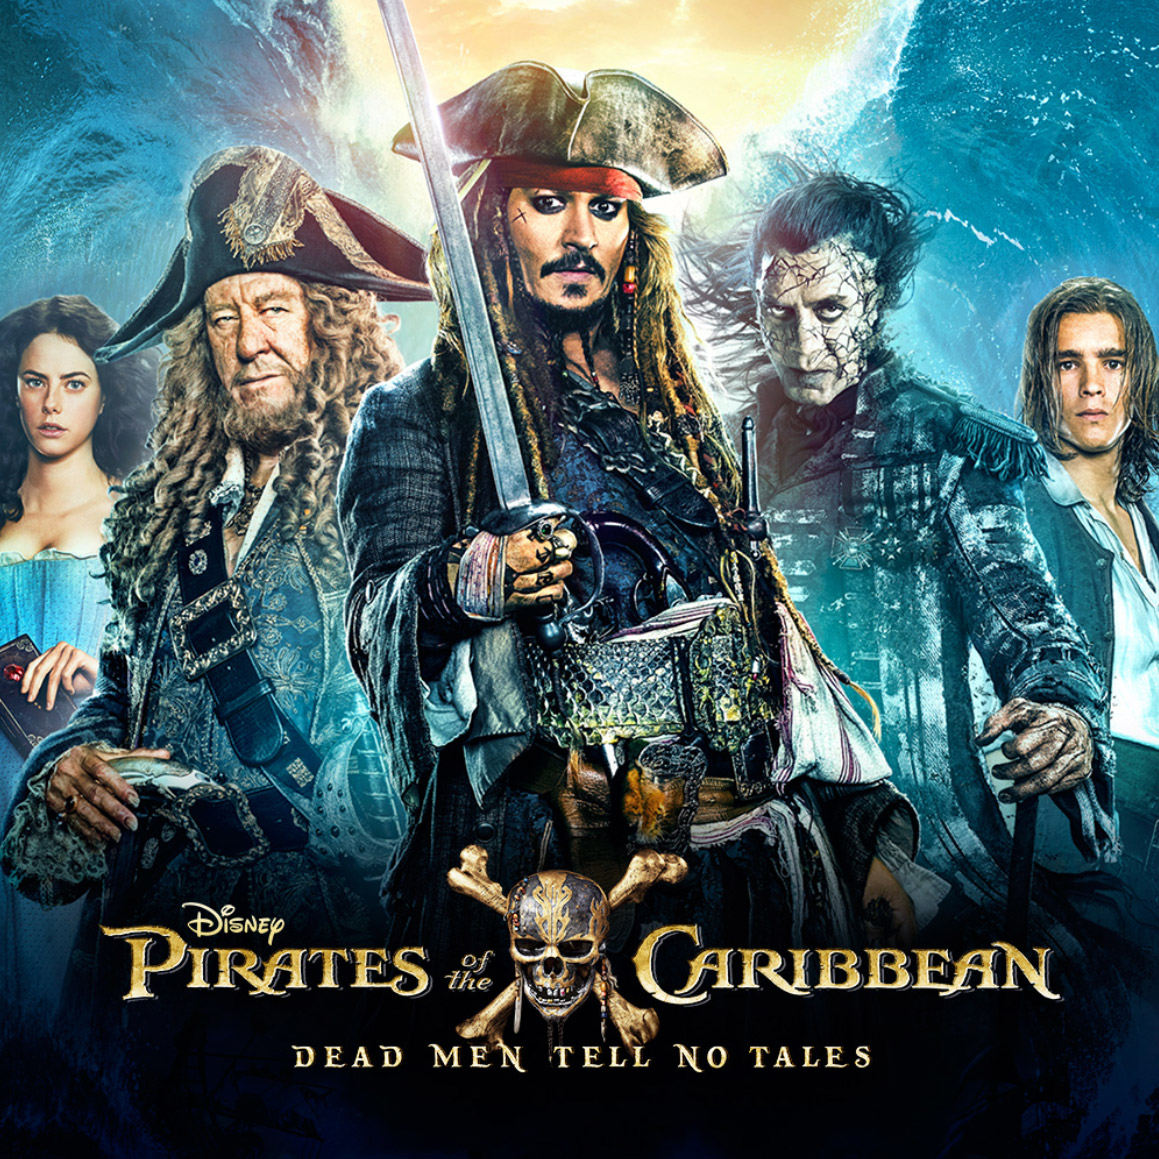 pirates_of_the_carribean.jpg